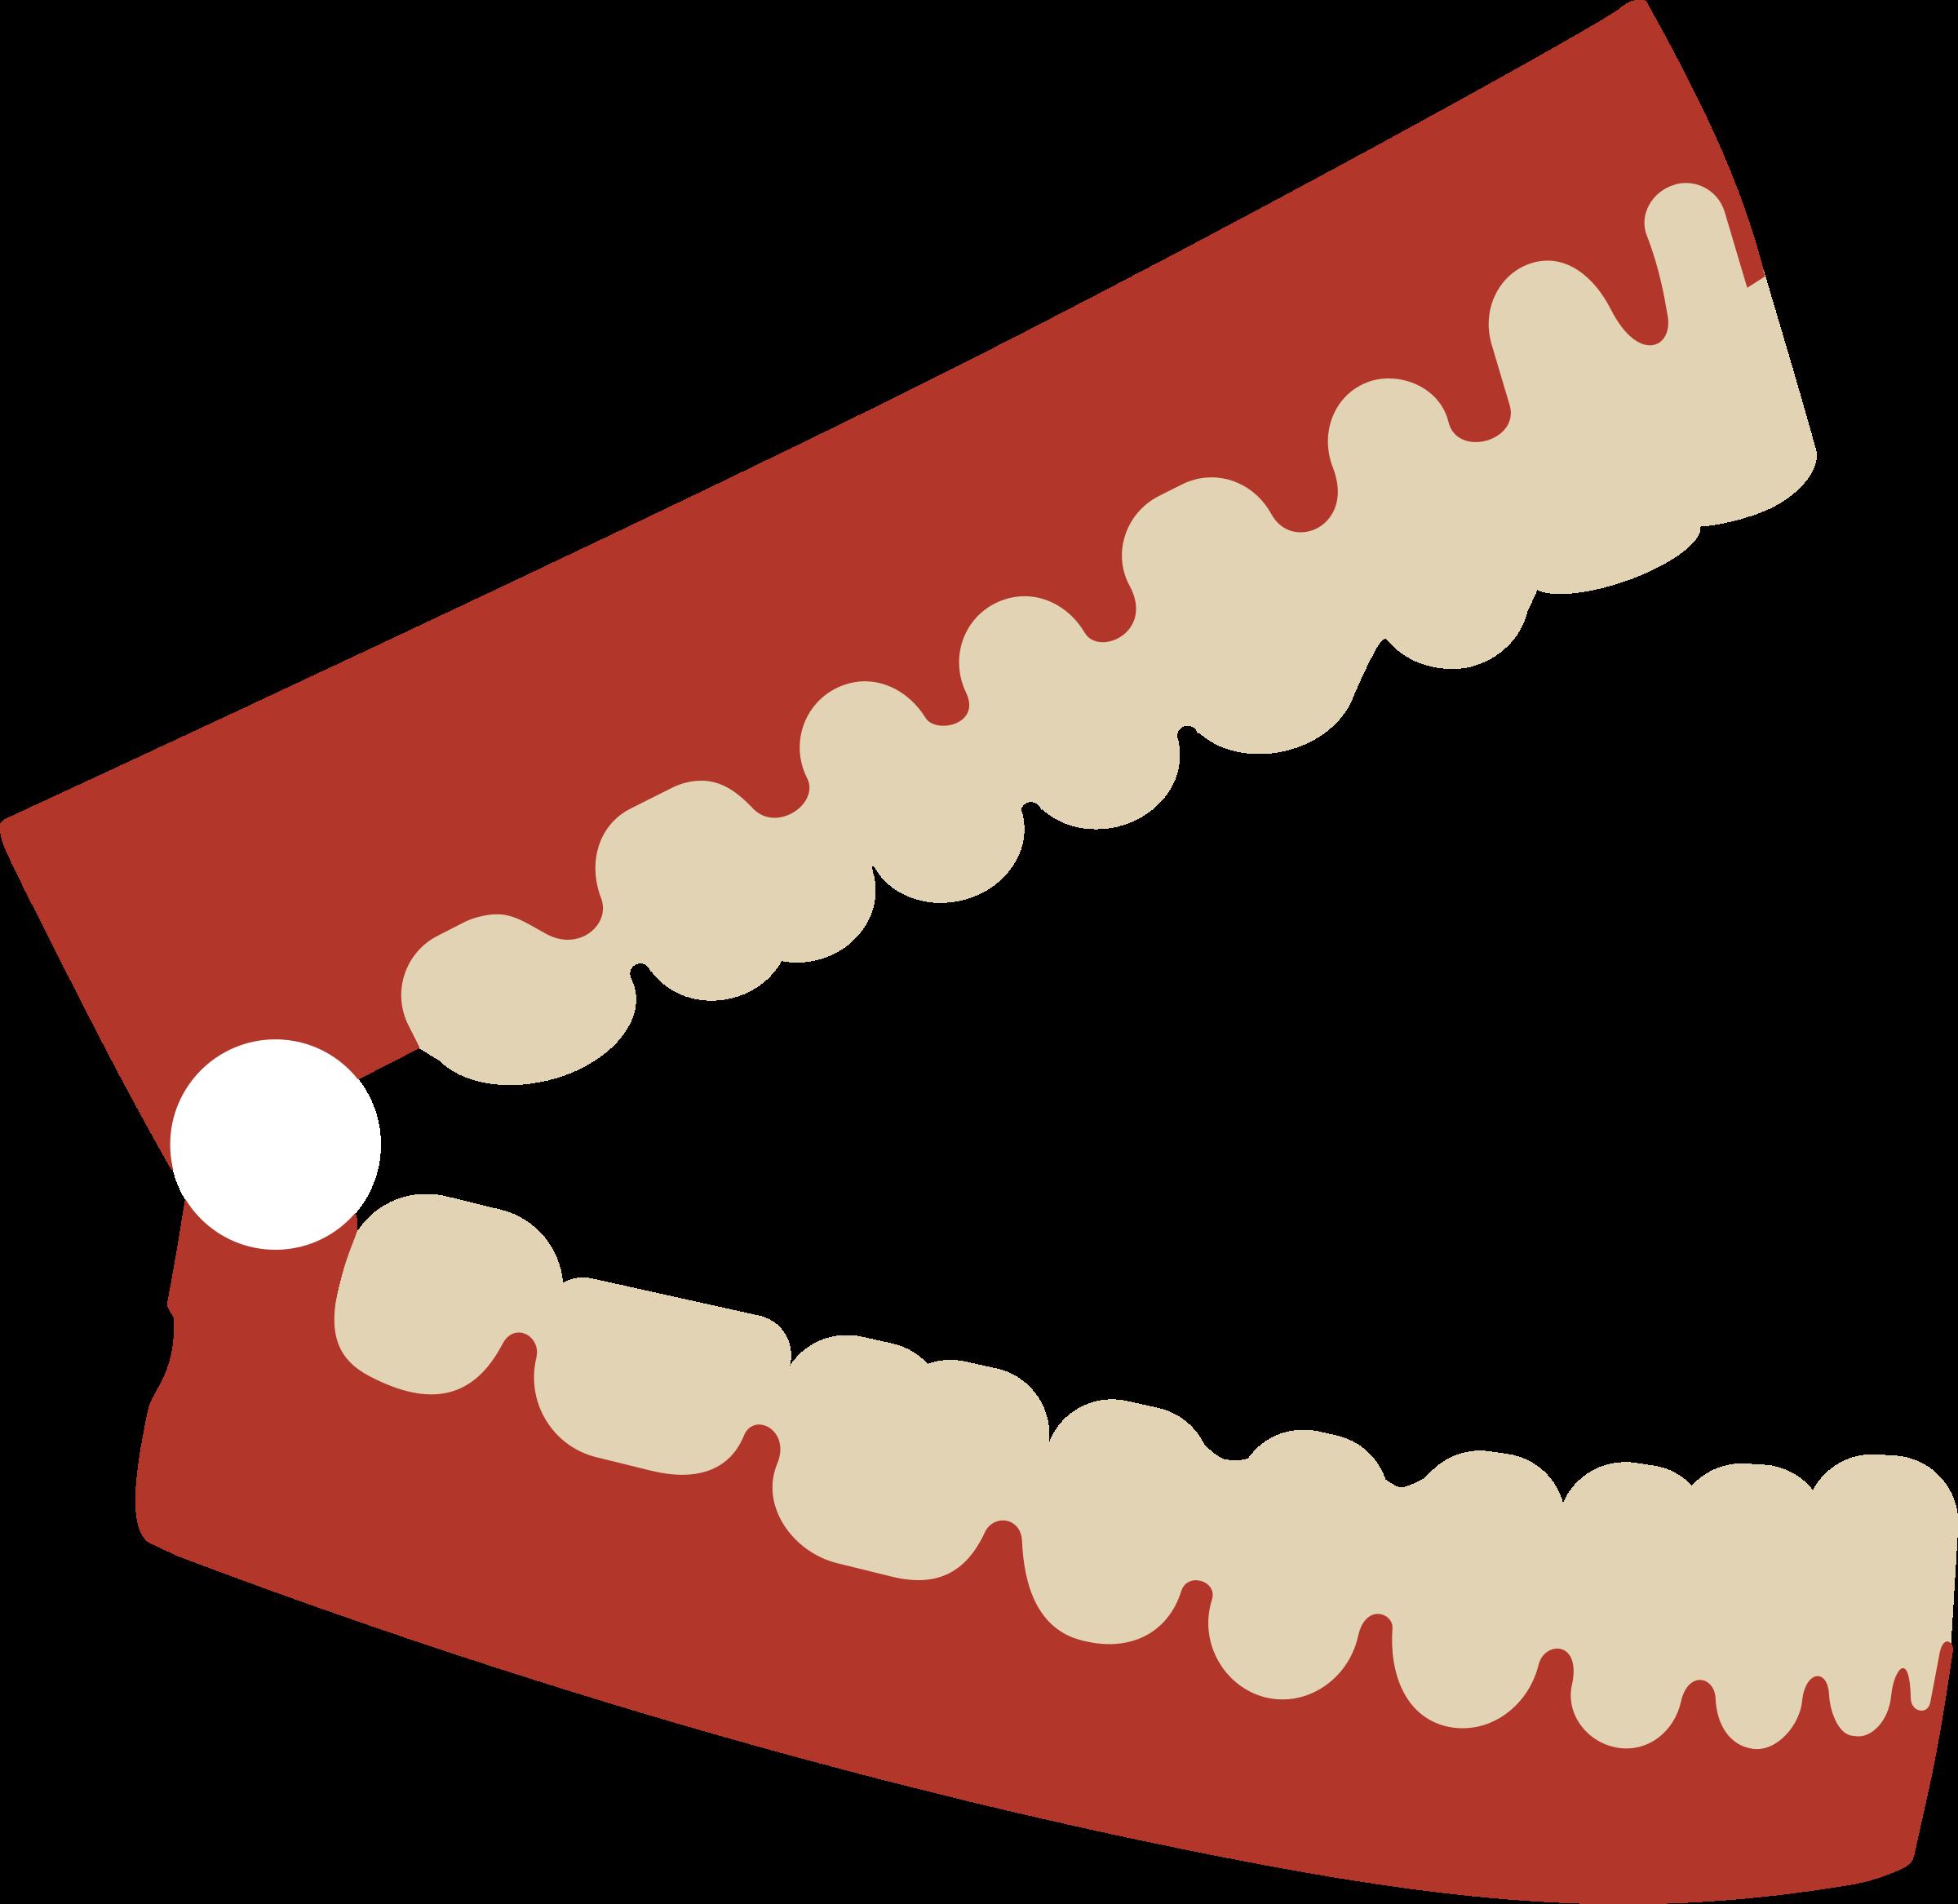 2400x2334 Brush Teeth Clipart Brushing Teeth Clipartmonk Free Clip Art